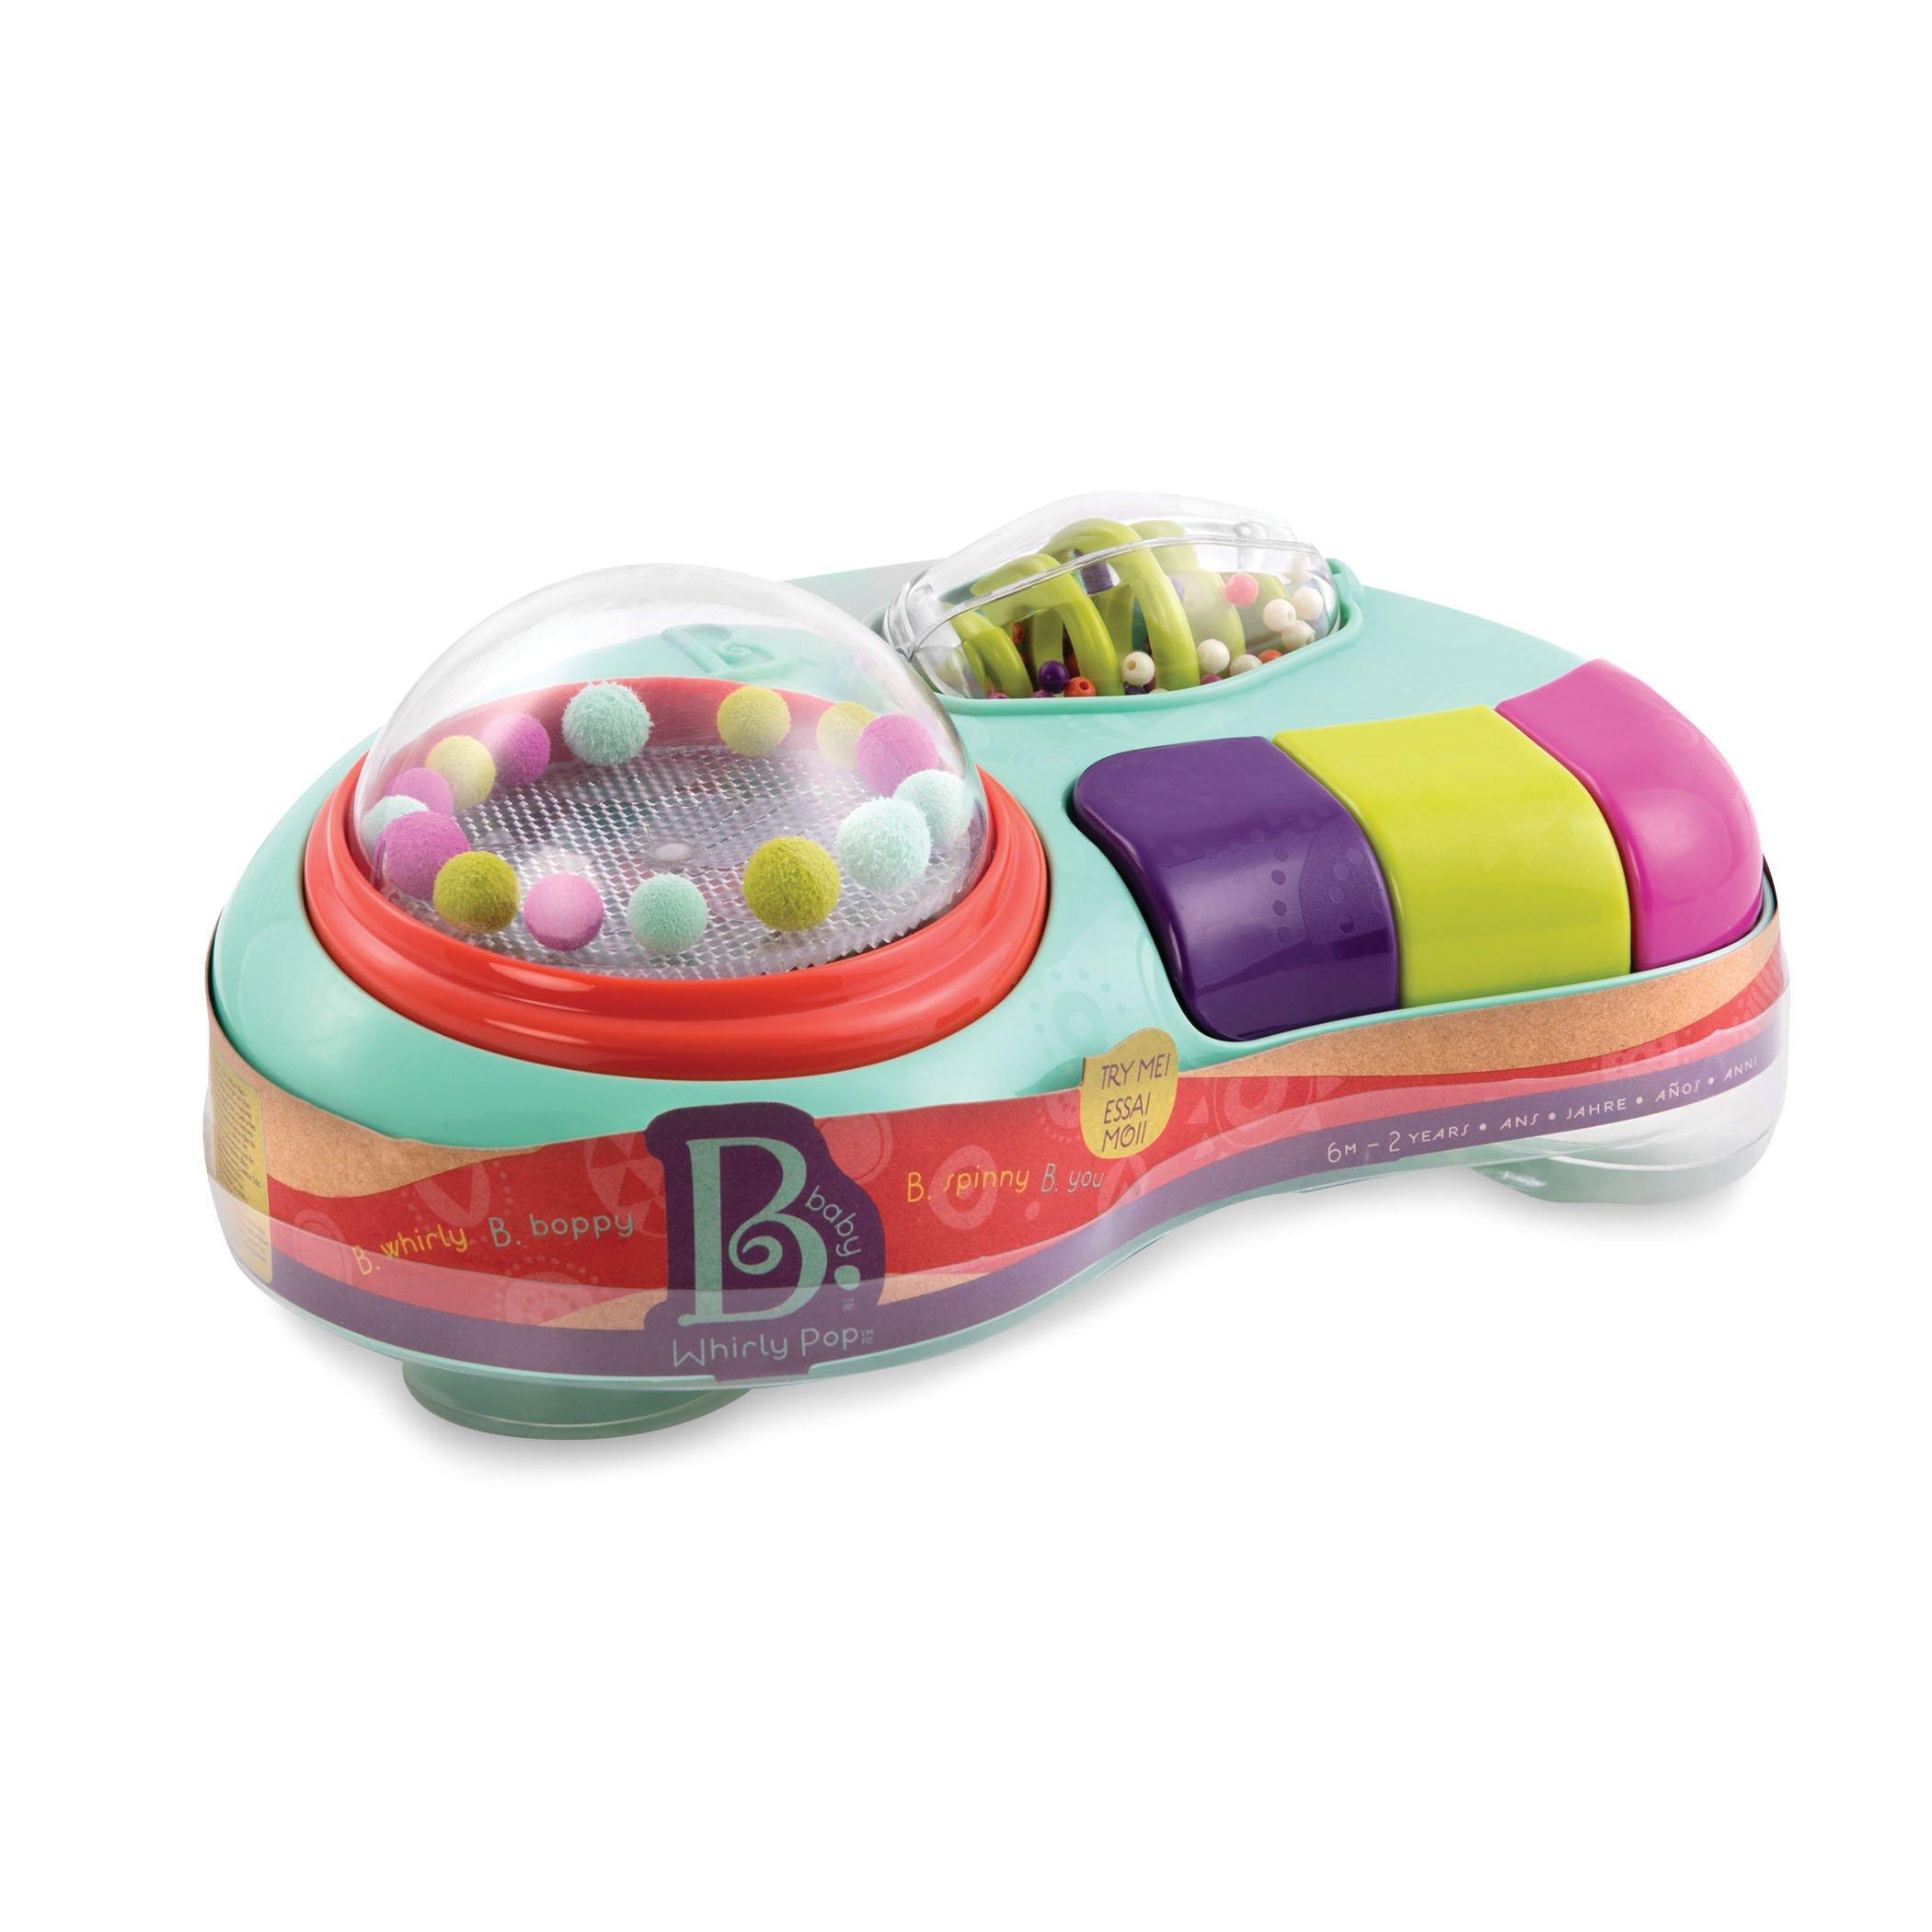 B. toys by Battat B. Whirly Pop